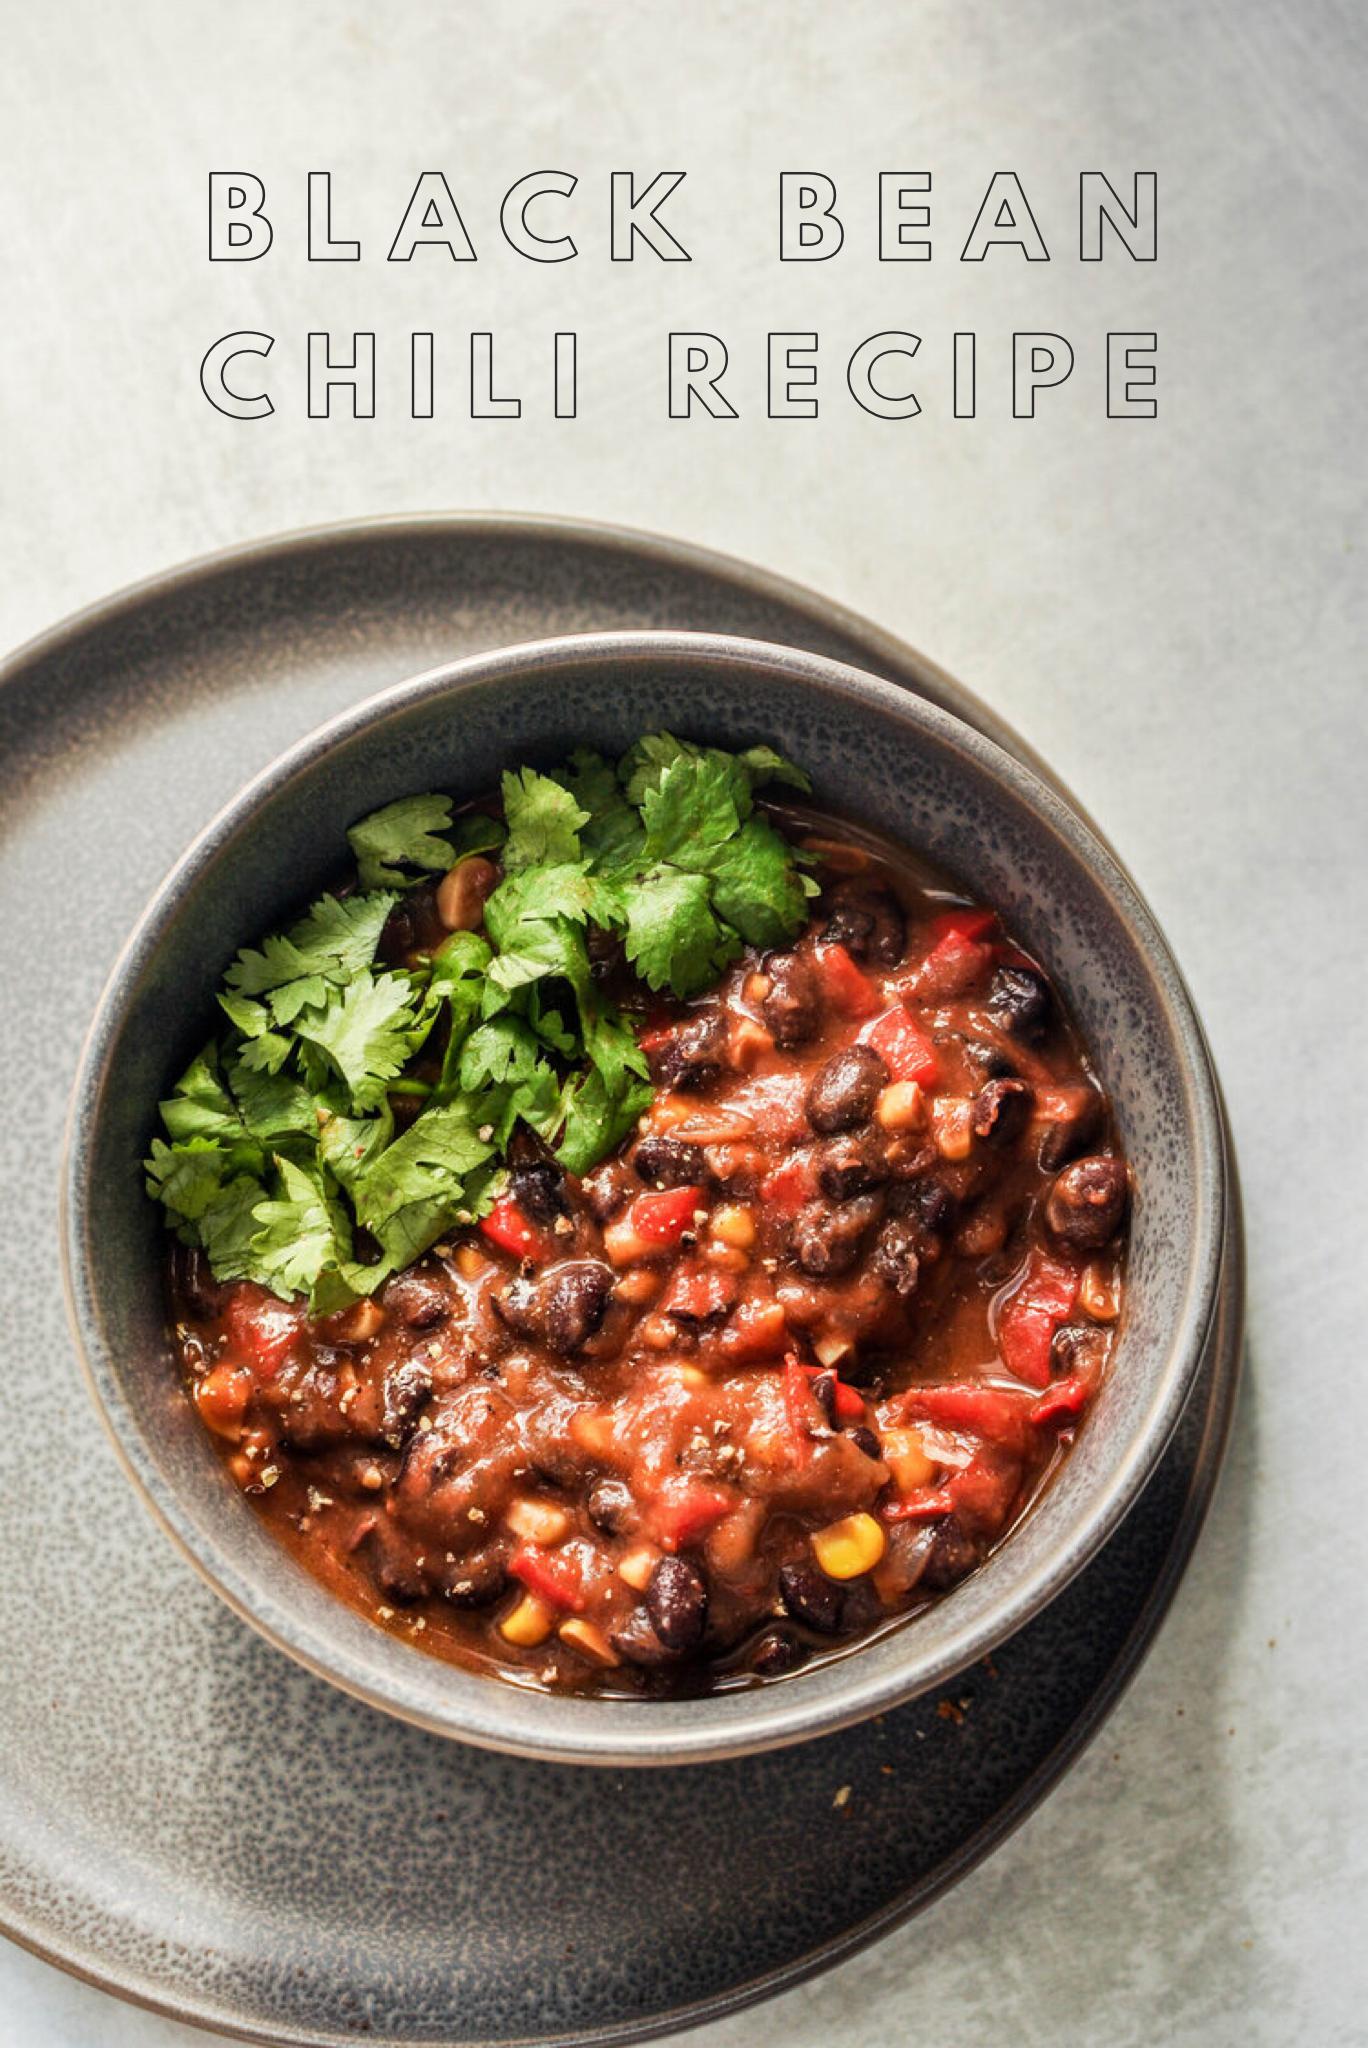 Black Bean Chili Recipe This Healthy Table Recipe Chili Recipe With Black Beans Bean Chili Recipe Easy Black Bean Chili Recipe